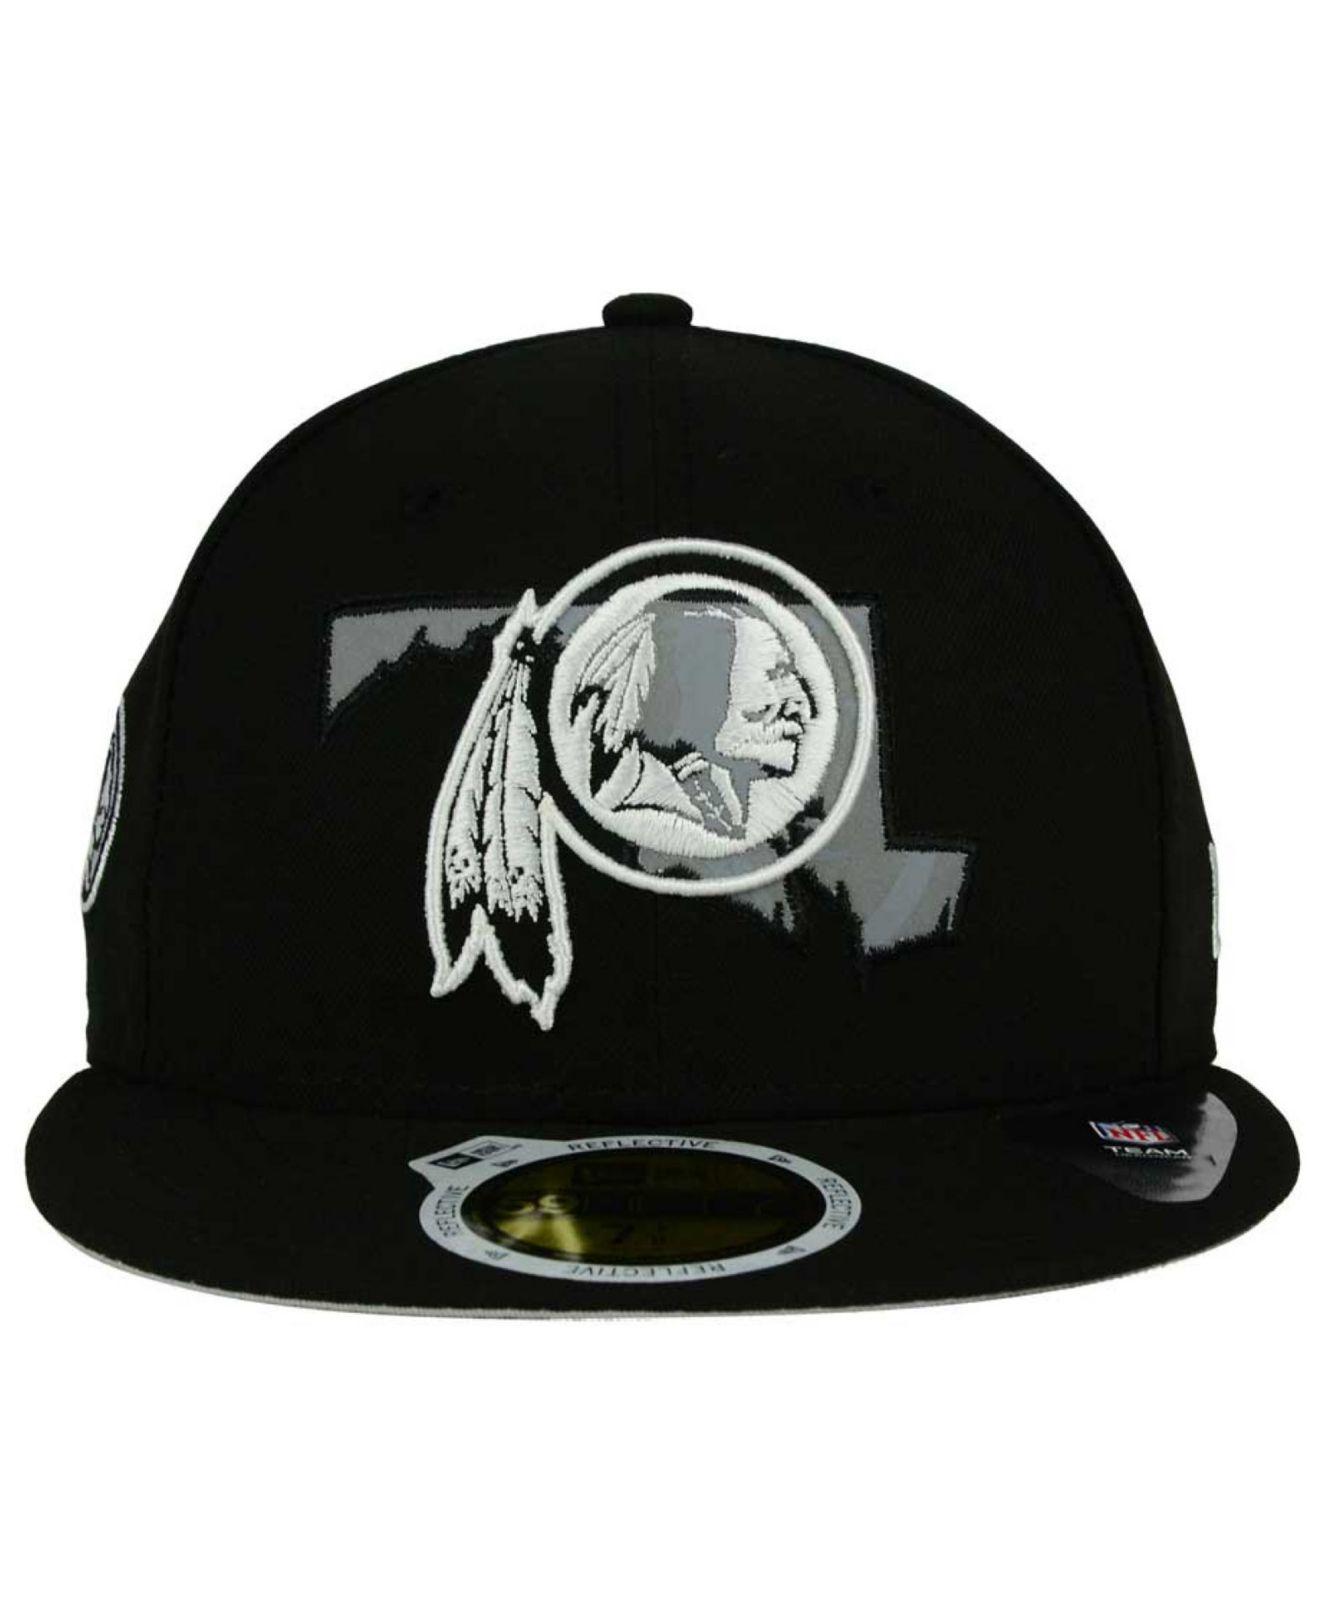 premium selection 7931e 97f40 KTZ Washington Redskins State Flective Redux 59fifty Cap in Black ...